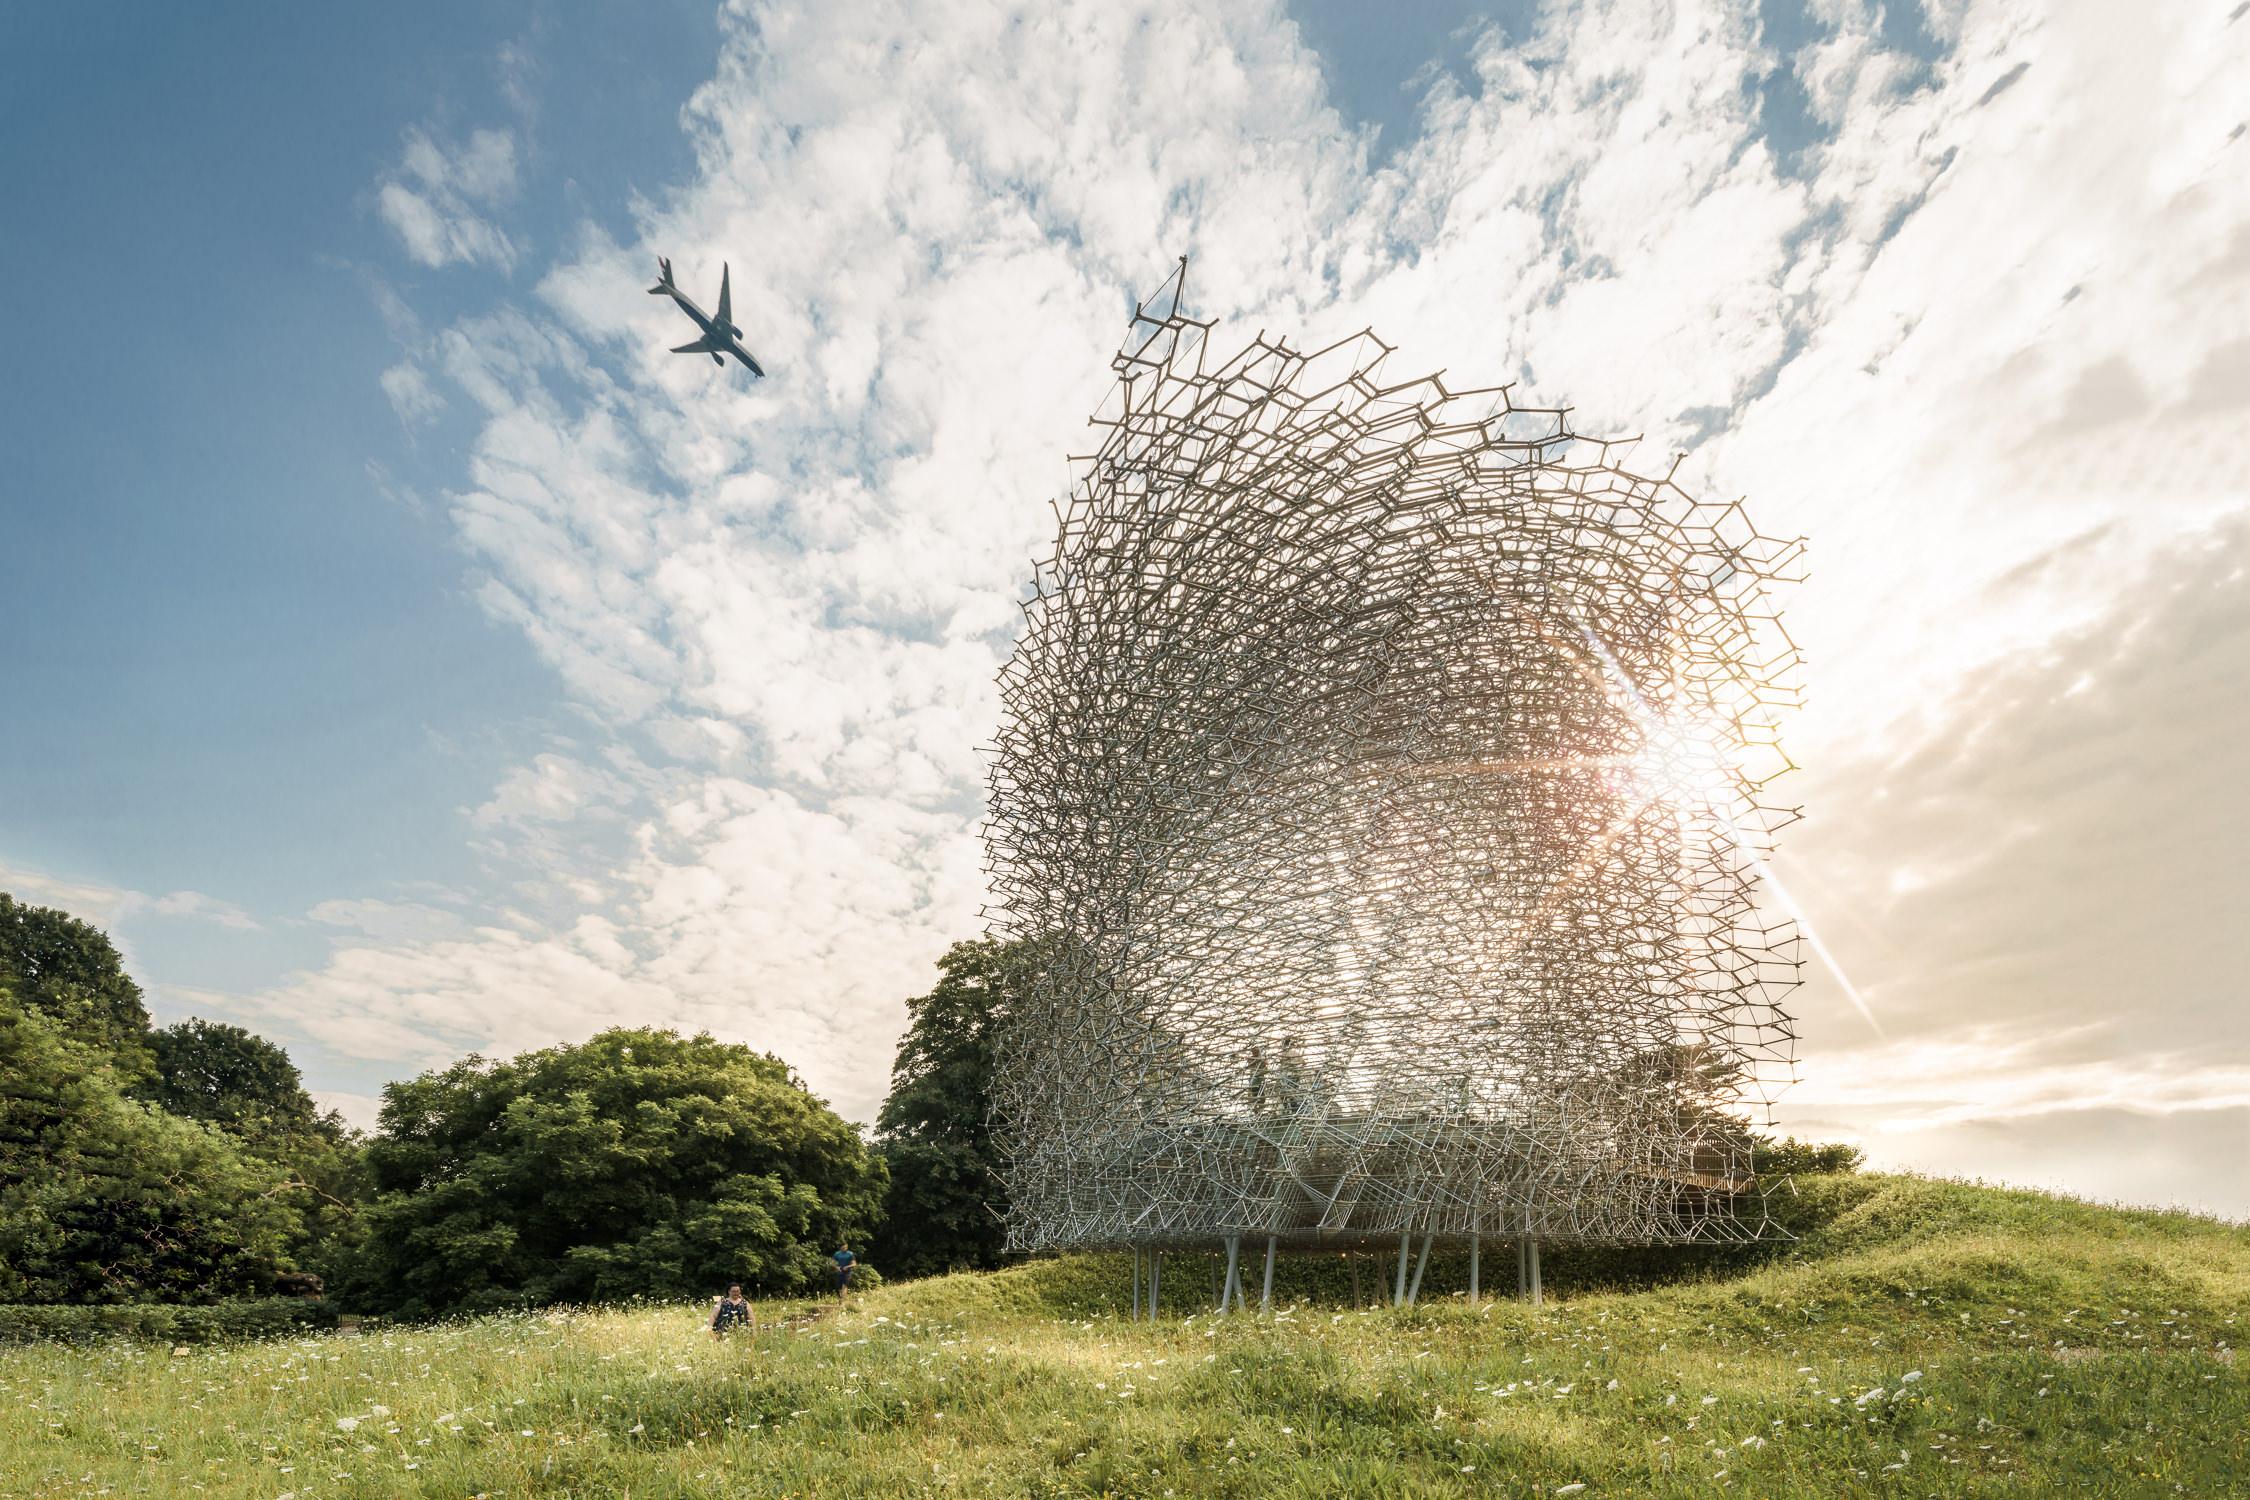 mark-hadden-architecture-photographer-architectuur-interieur-fotografie-london-amsterdam-hive-kew-045-2.jpg